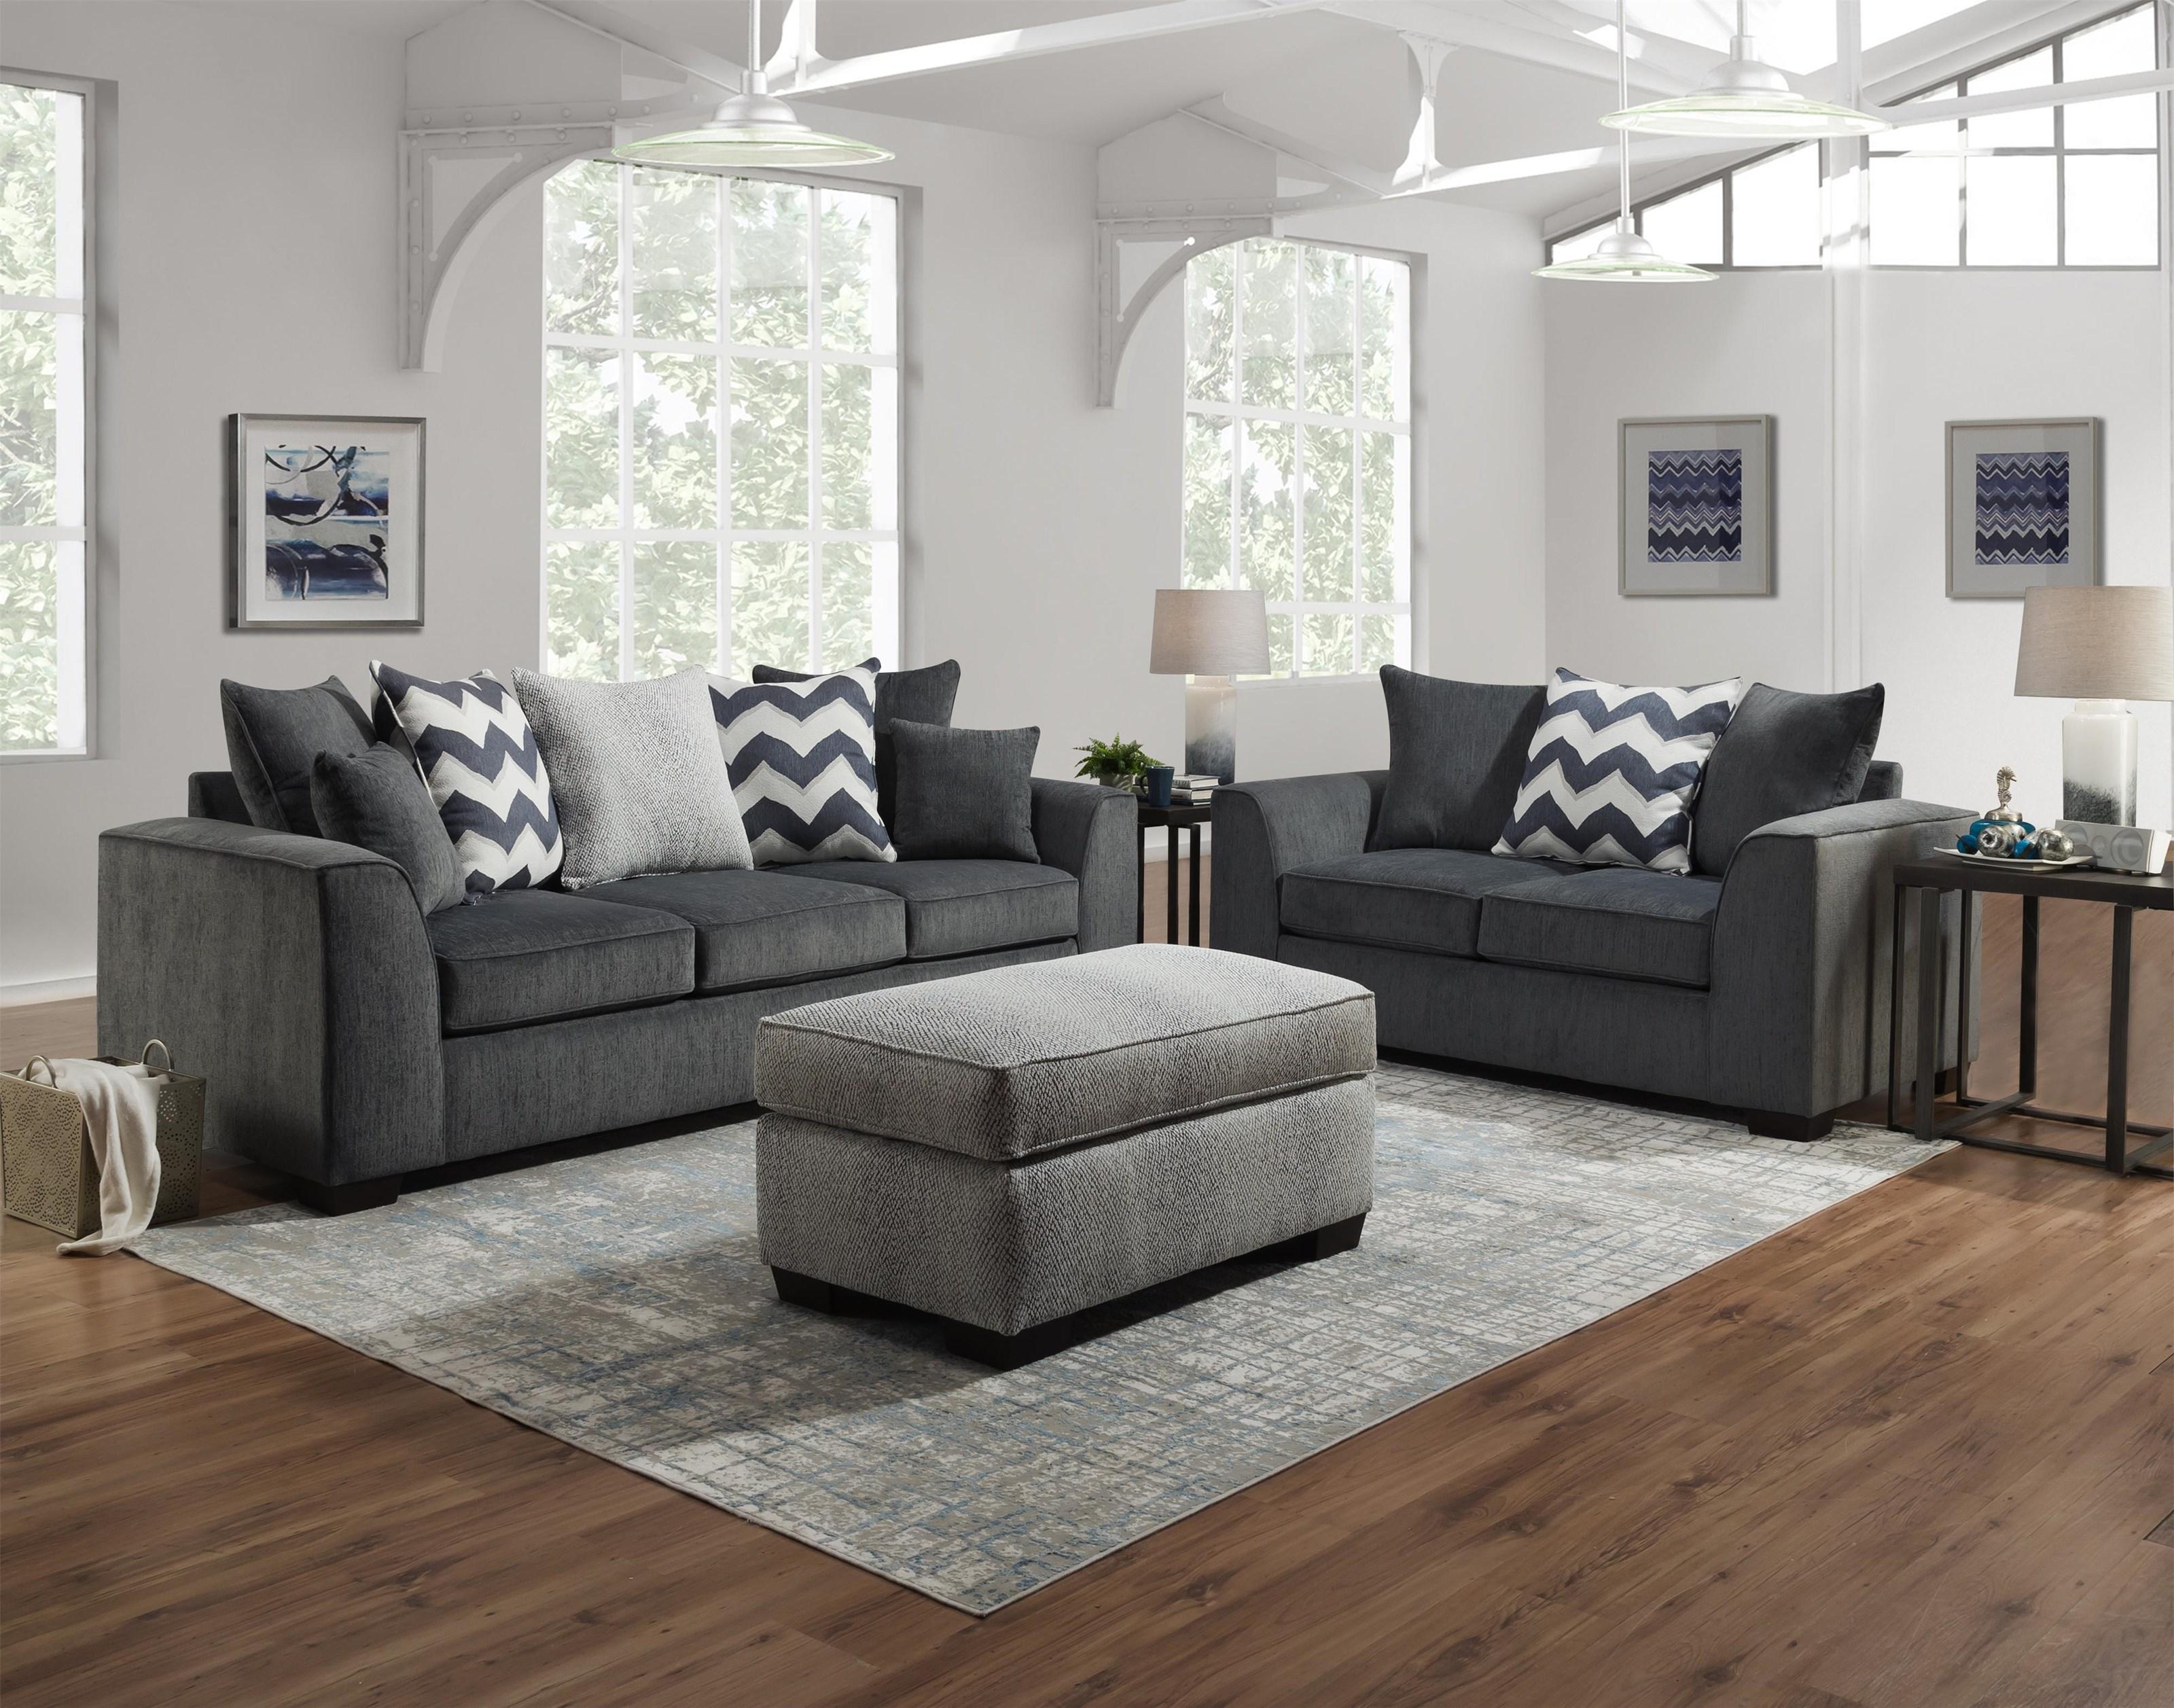 2600 Loveseat by Peak Living at Darvin Furniture